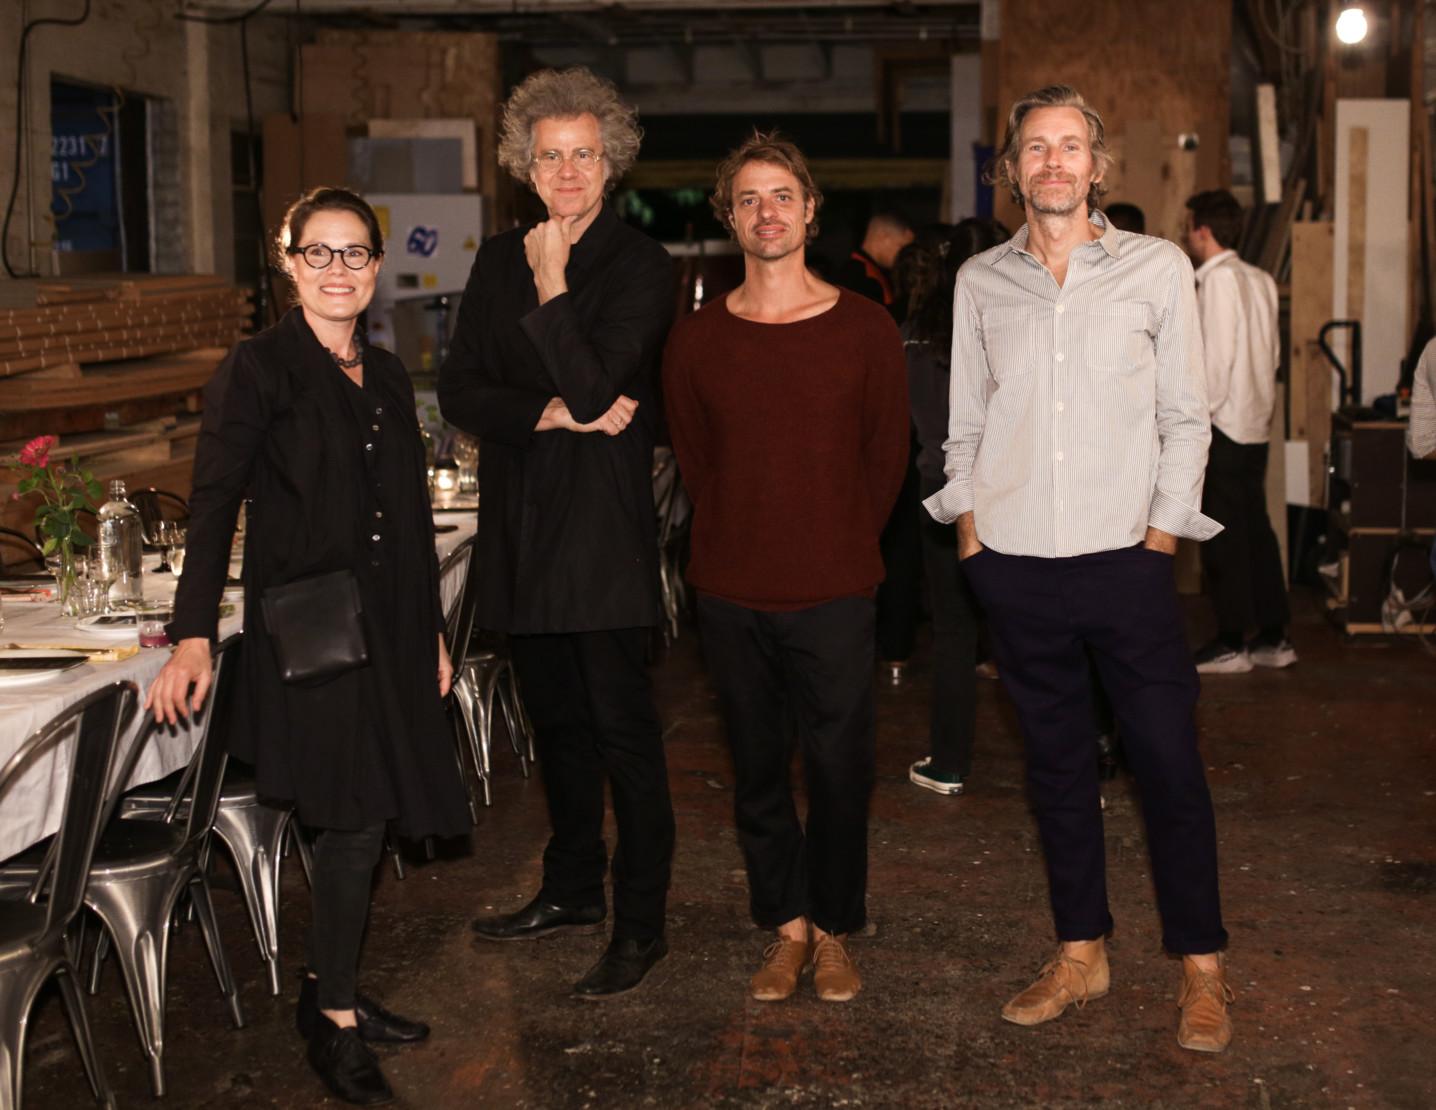 Harriet Girardoni, Johannes Girardoni, Orpheo McCord and Joel Shearer.